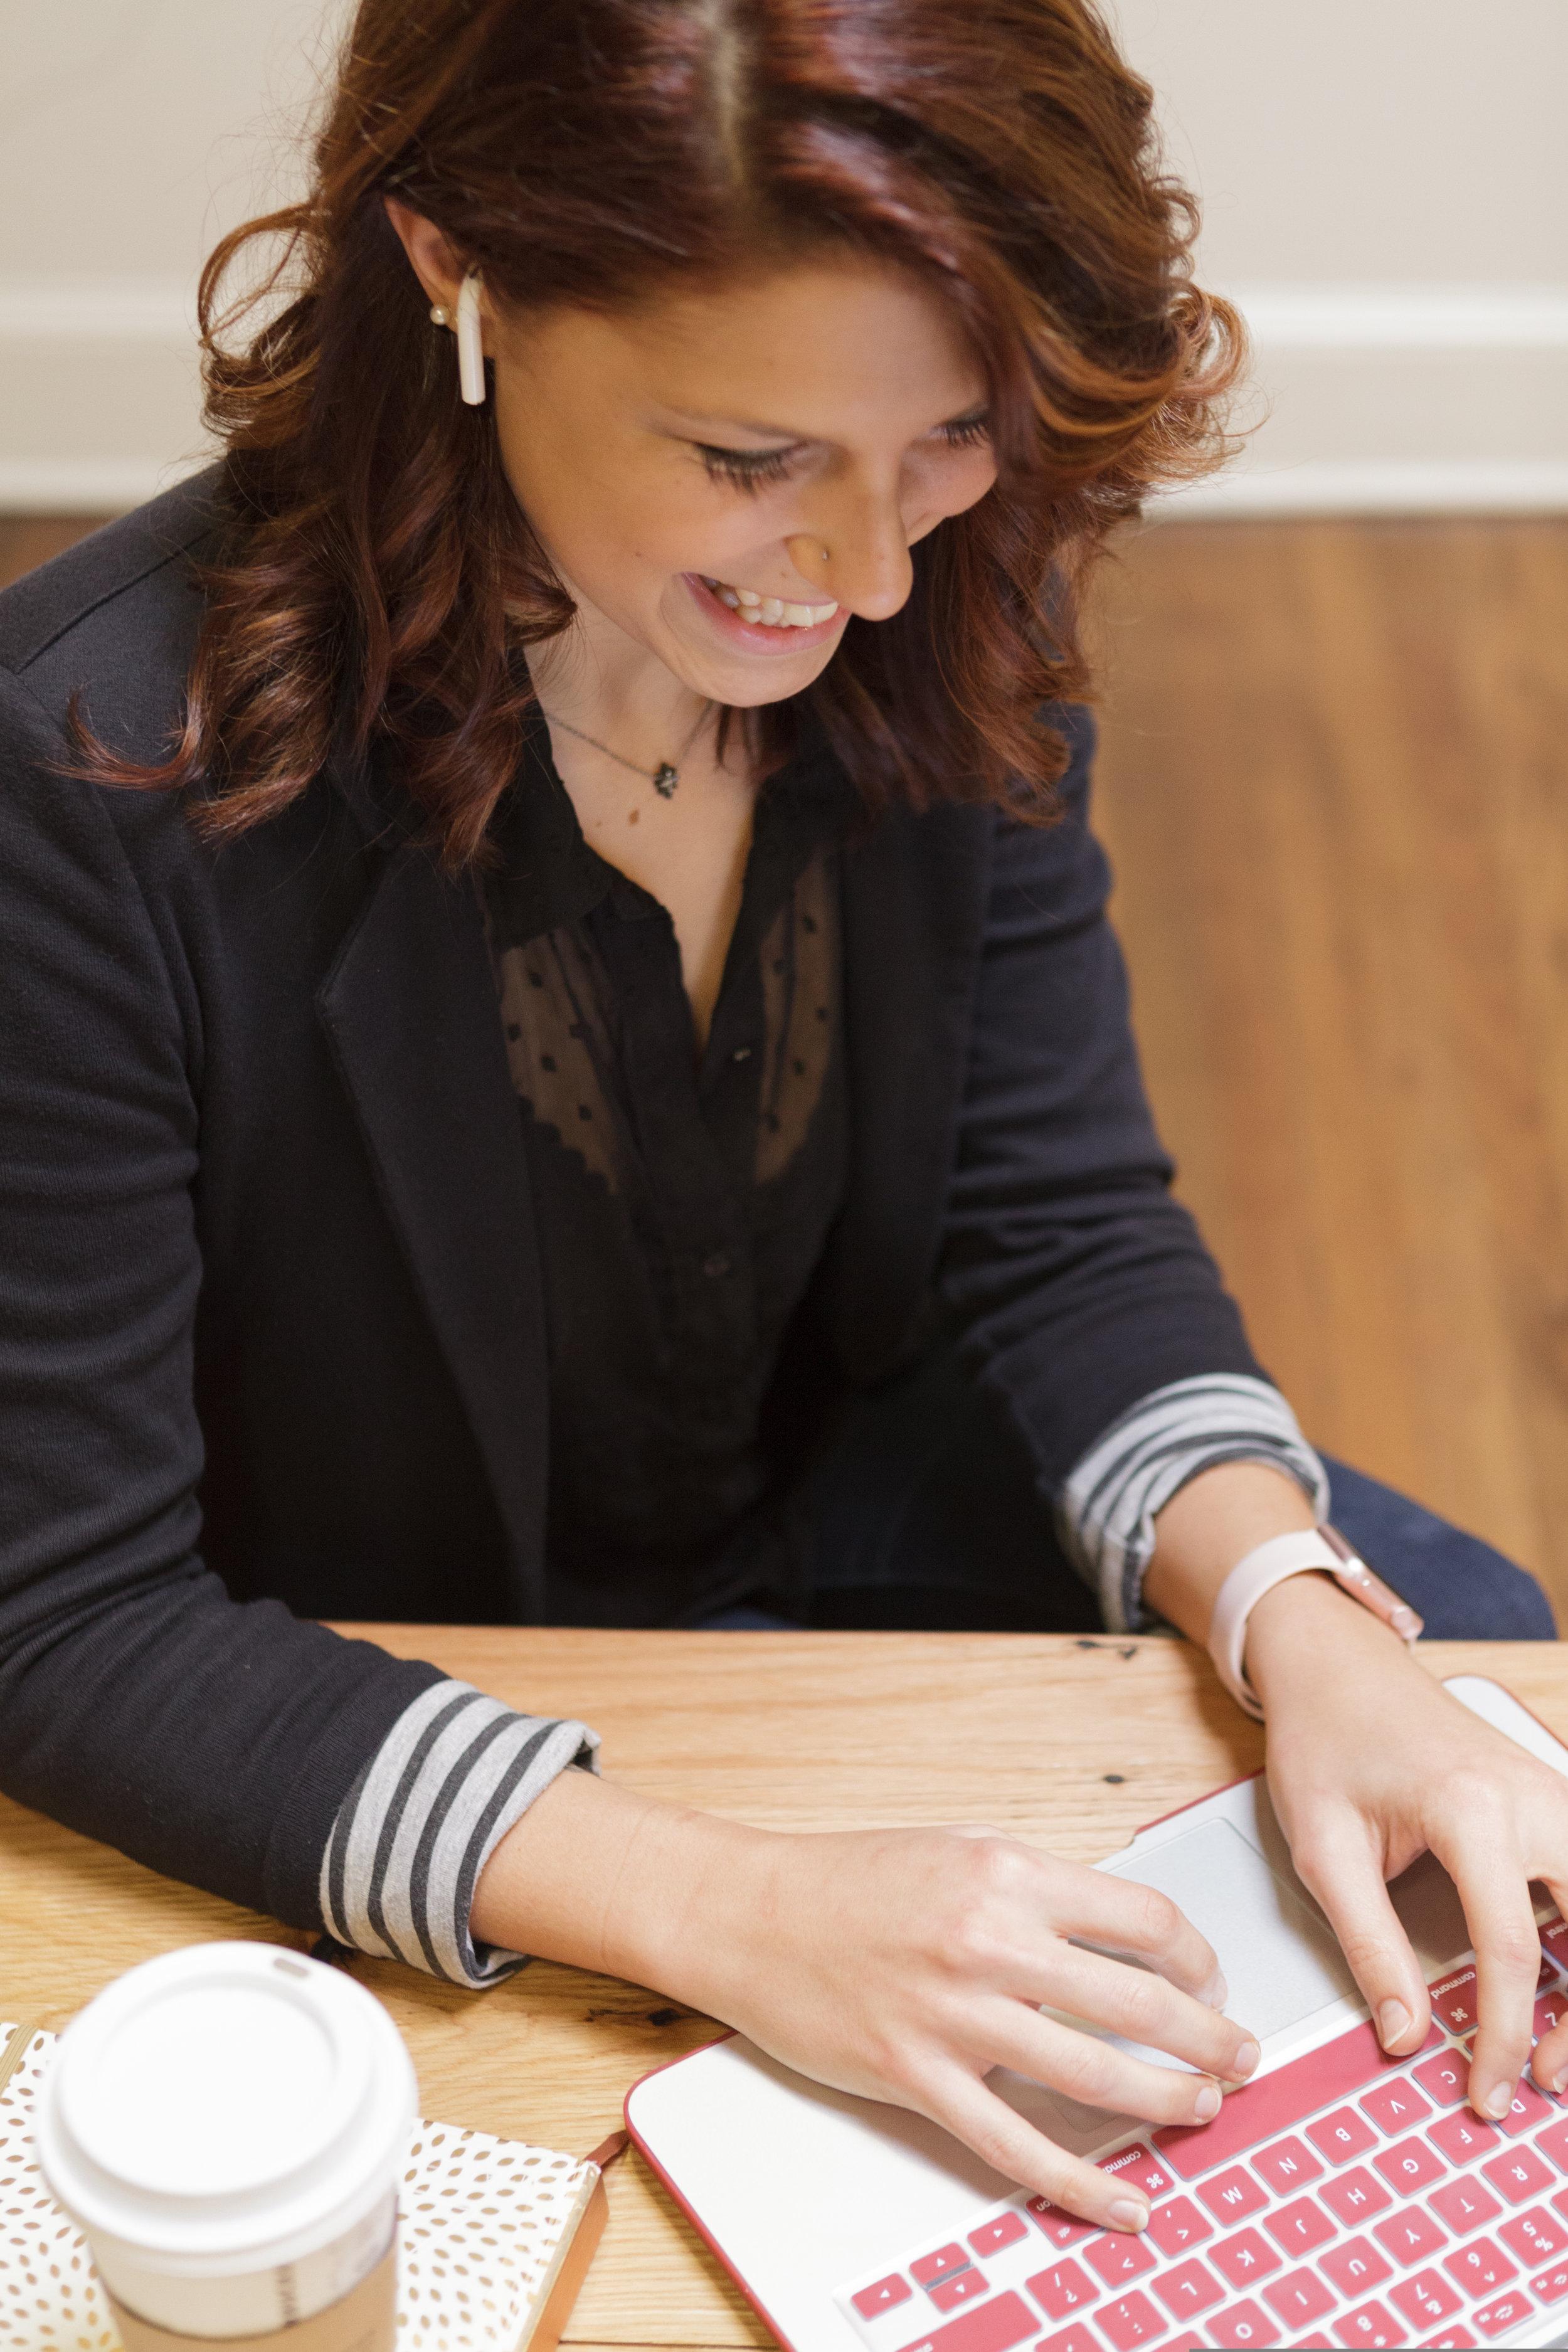 enid-brenize-writing-on-laptop-during-coaching-copywriting-session